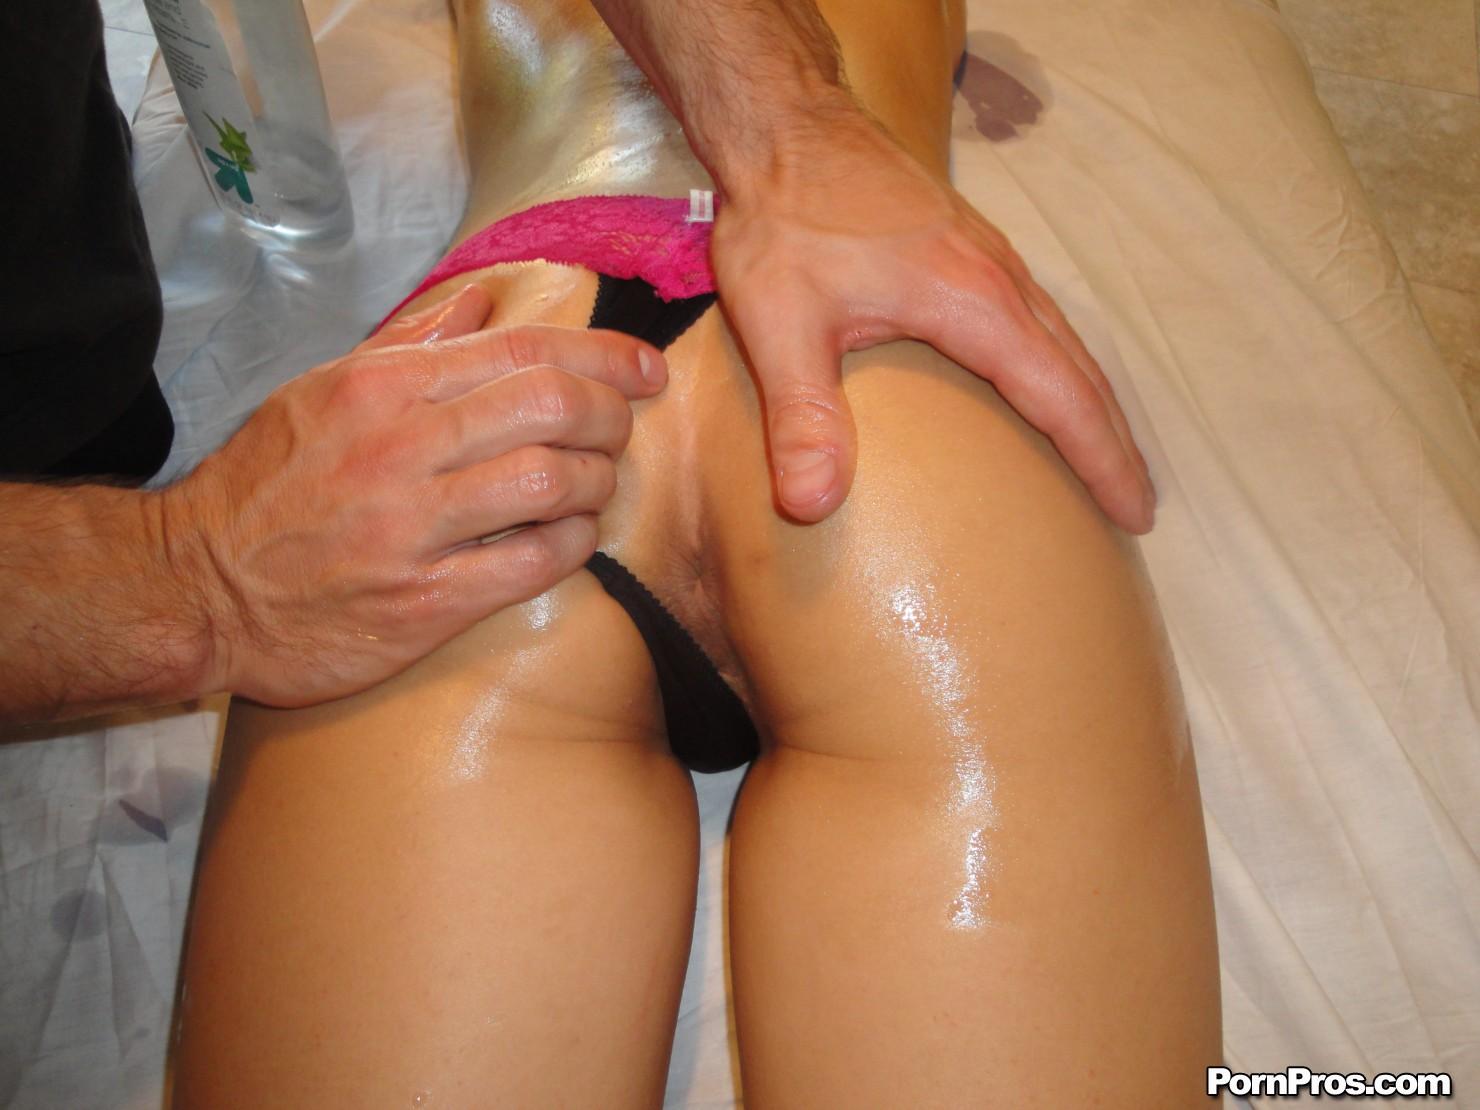 massage happy ending adult Victoria